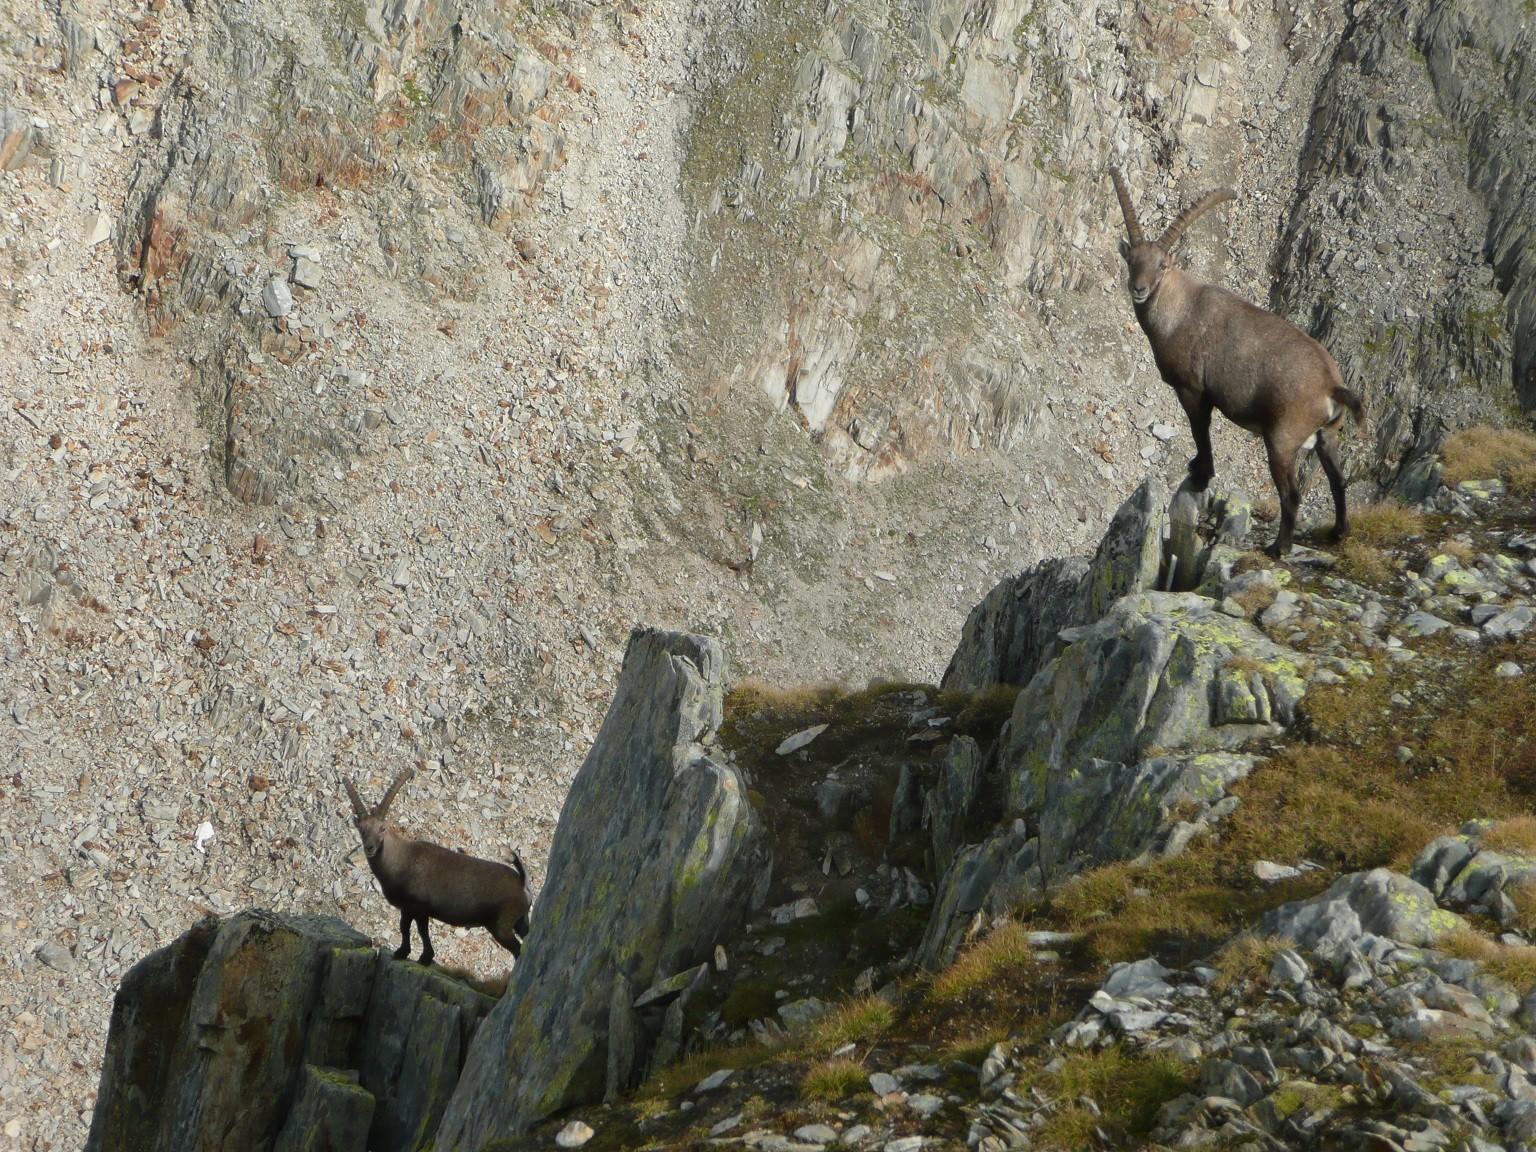 In den Bergen ist man stets unter genauer Beobachtung, Gotthard, TI